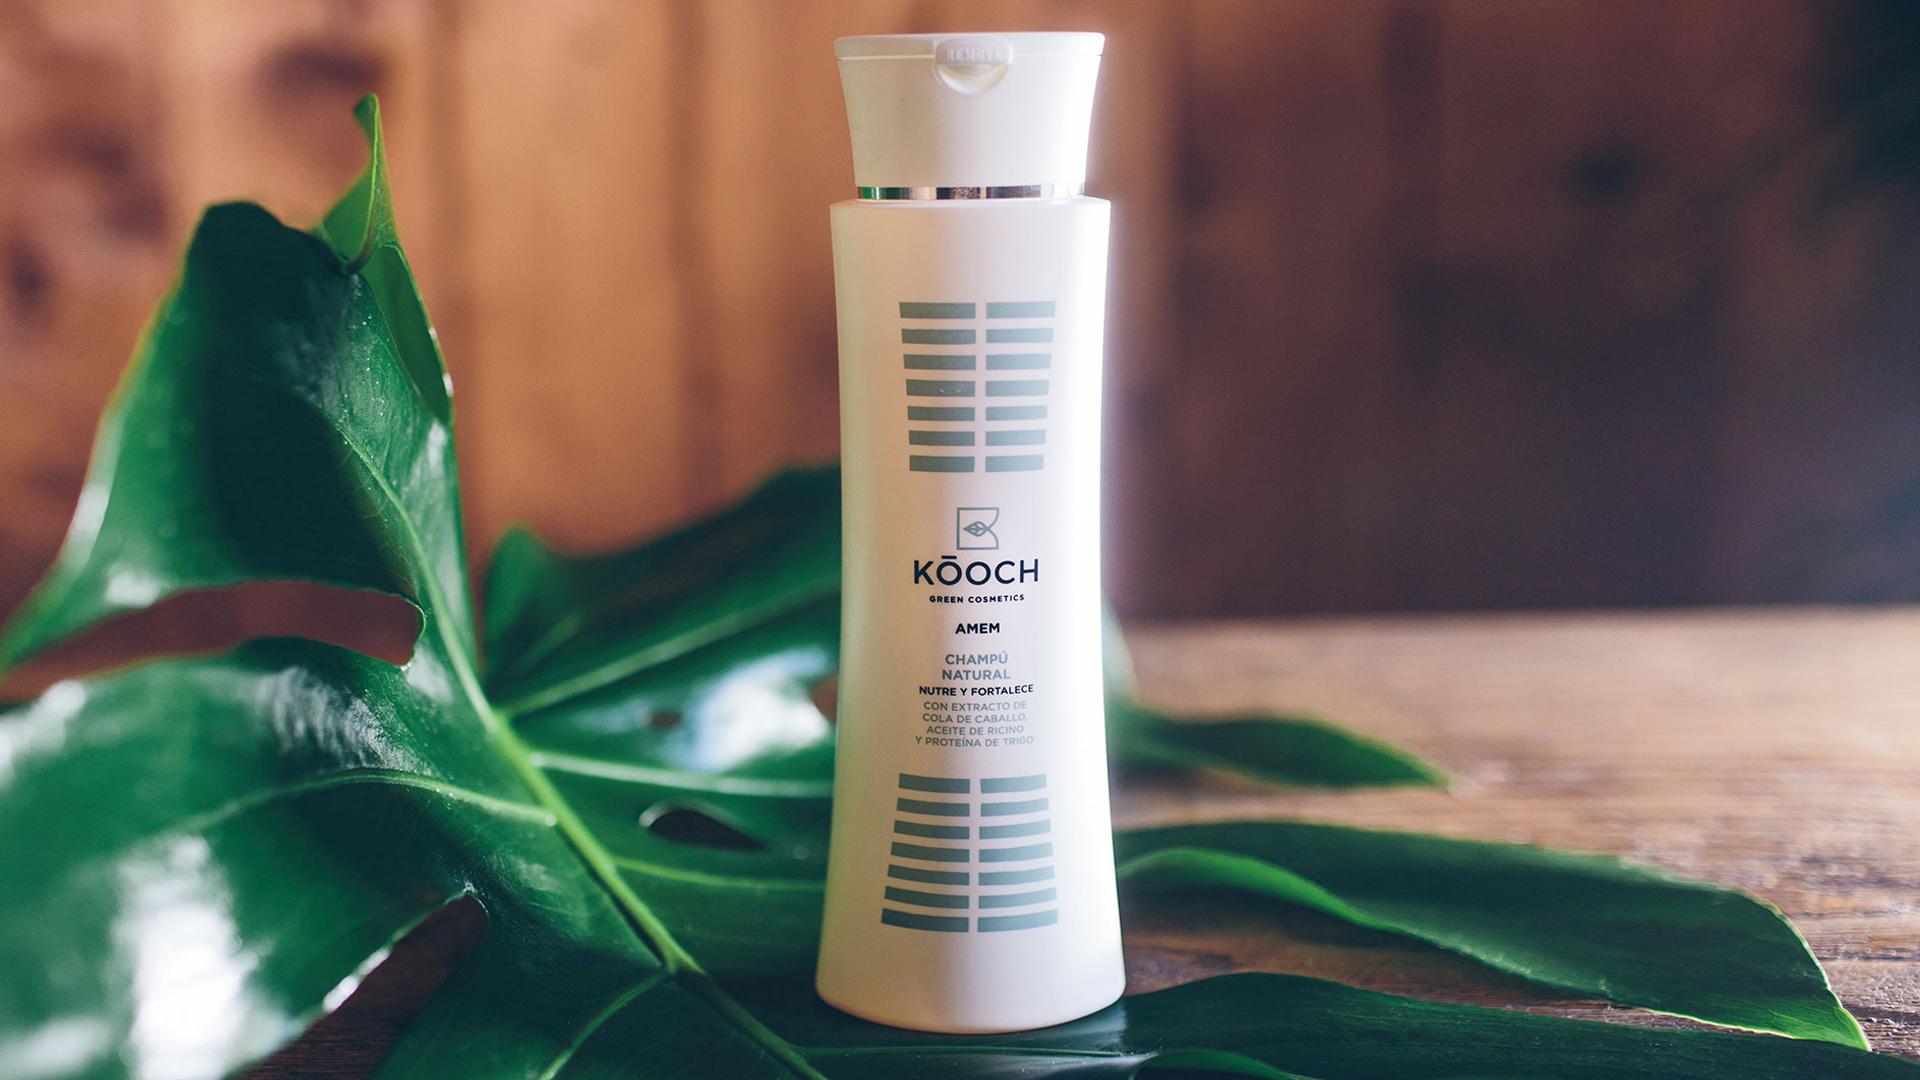 branding-packaging-identidad-kooch-green-cosmetica-sara-quintana-logo-cosmetica-ecologica